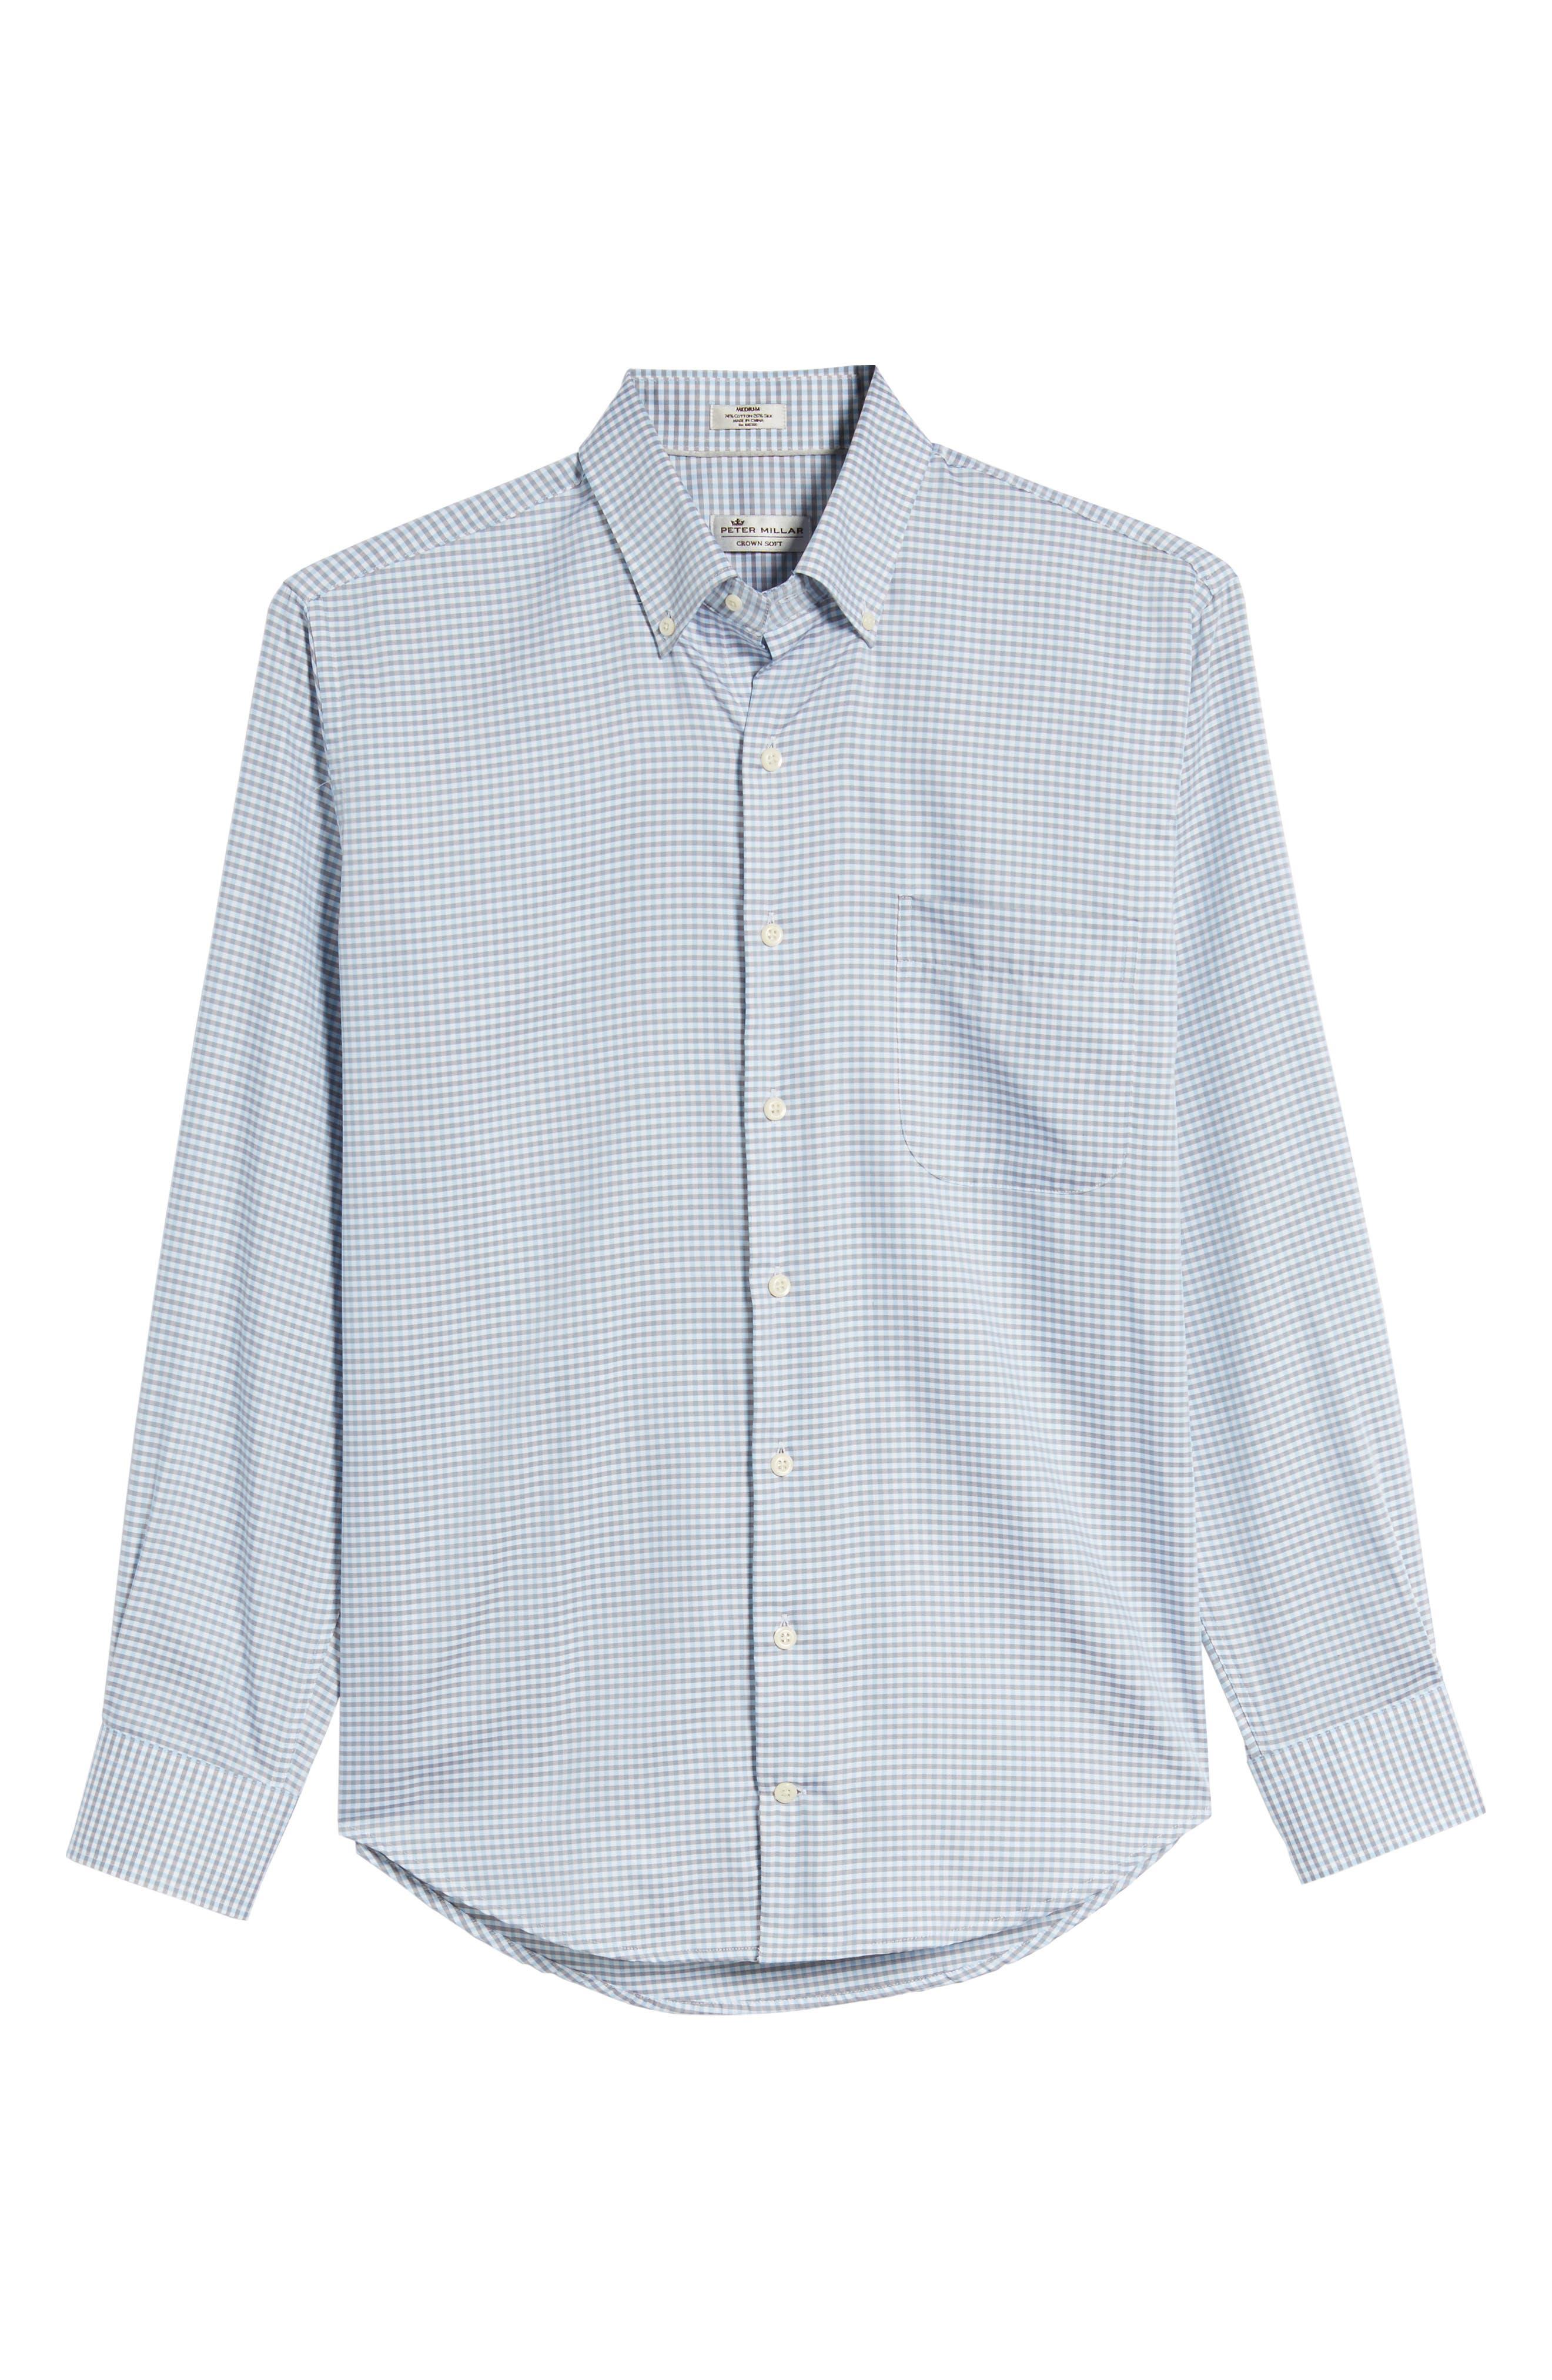 Crown Classic Fit Mini Check Sport Shirt,                             Alternate thumbnail 6, color,                             TAR HEEL BLUE